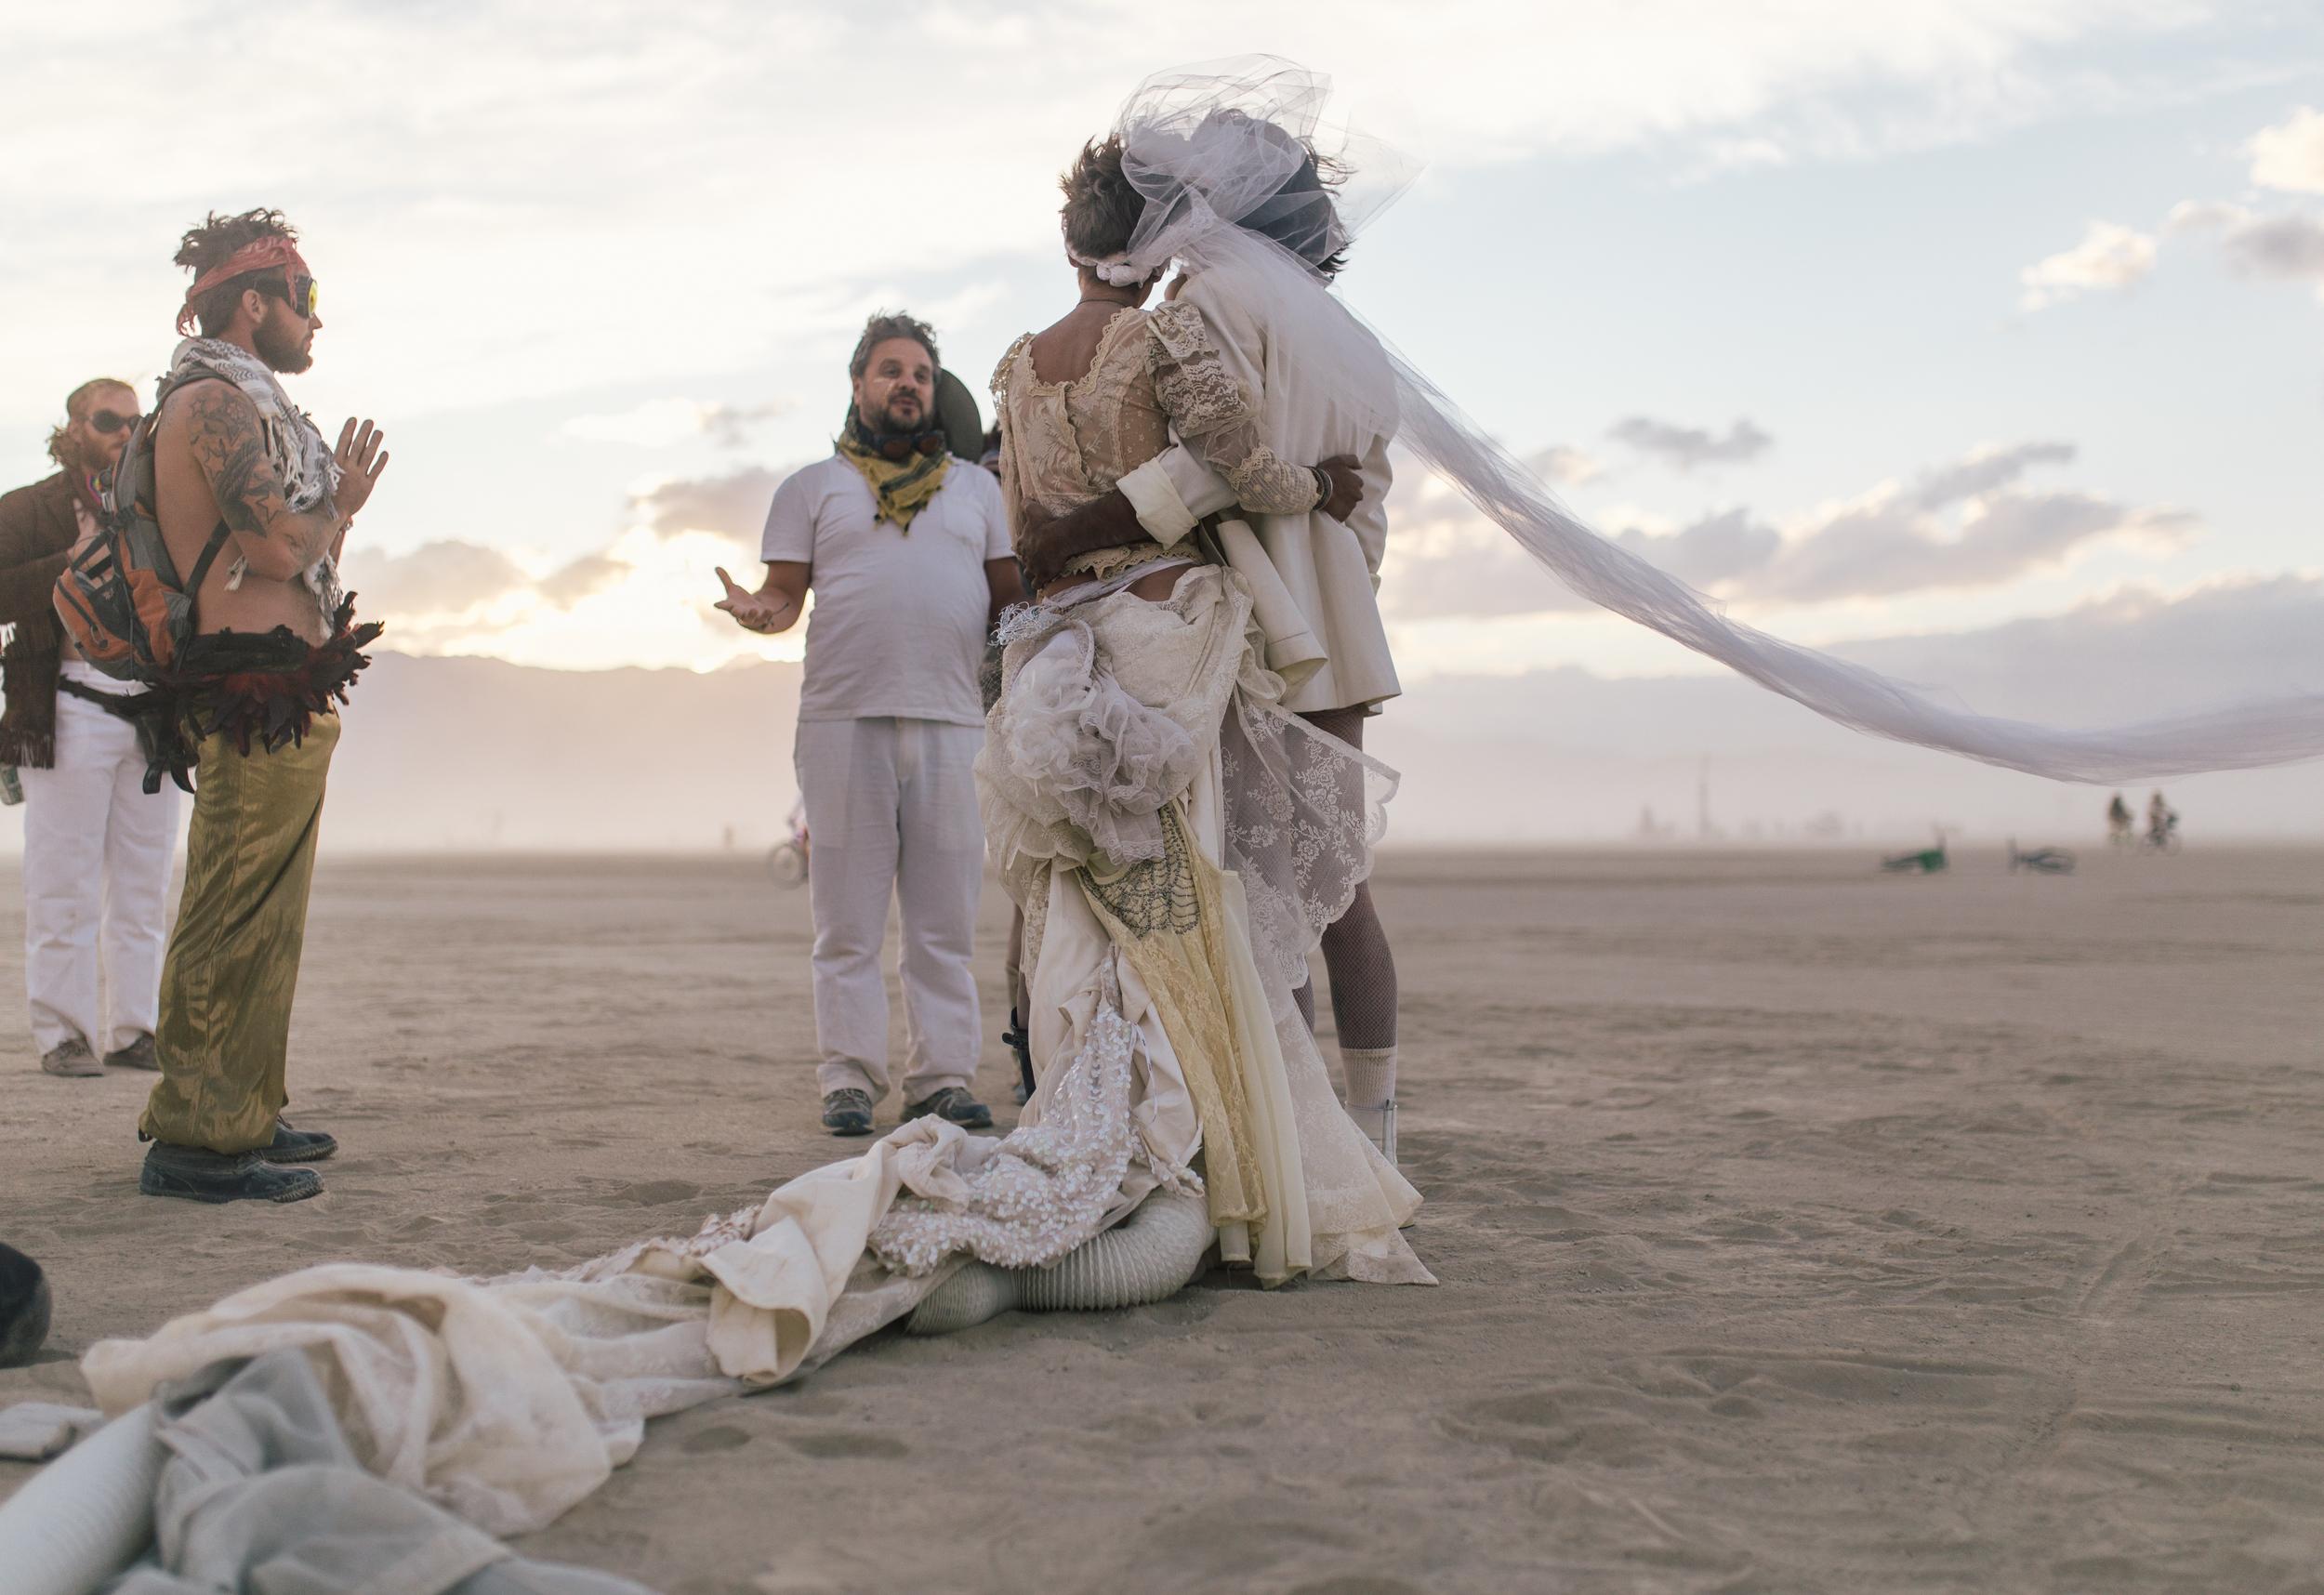 Adventure wedding photographer - Burning Man weddings